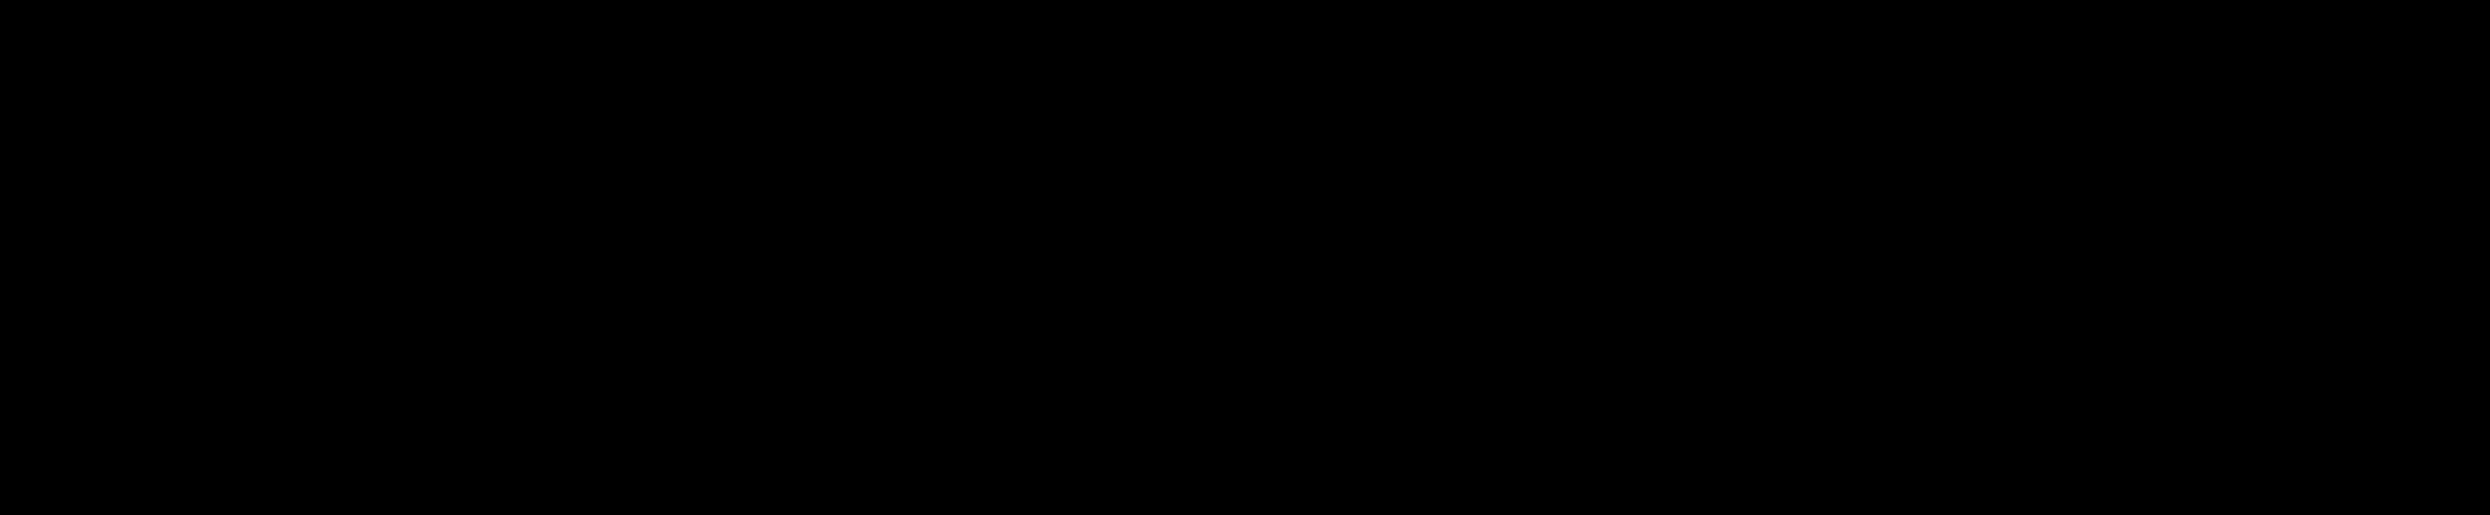 Logo - Inabox - Main PCM